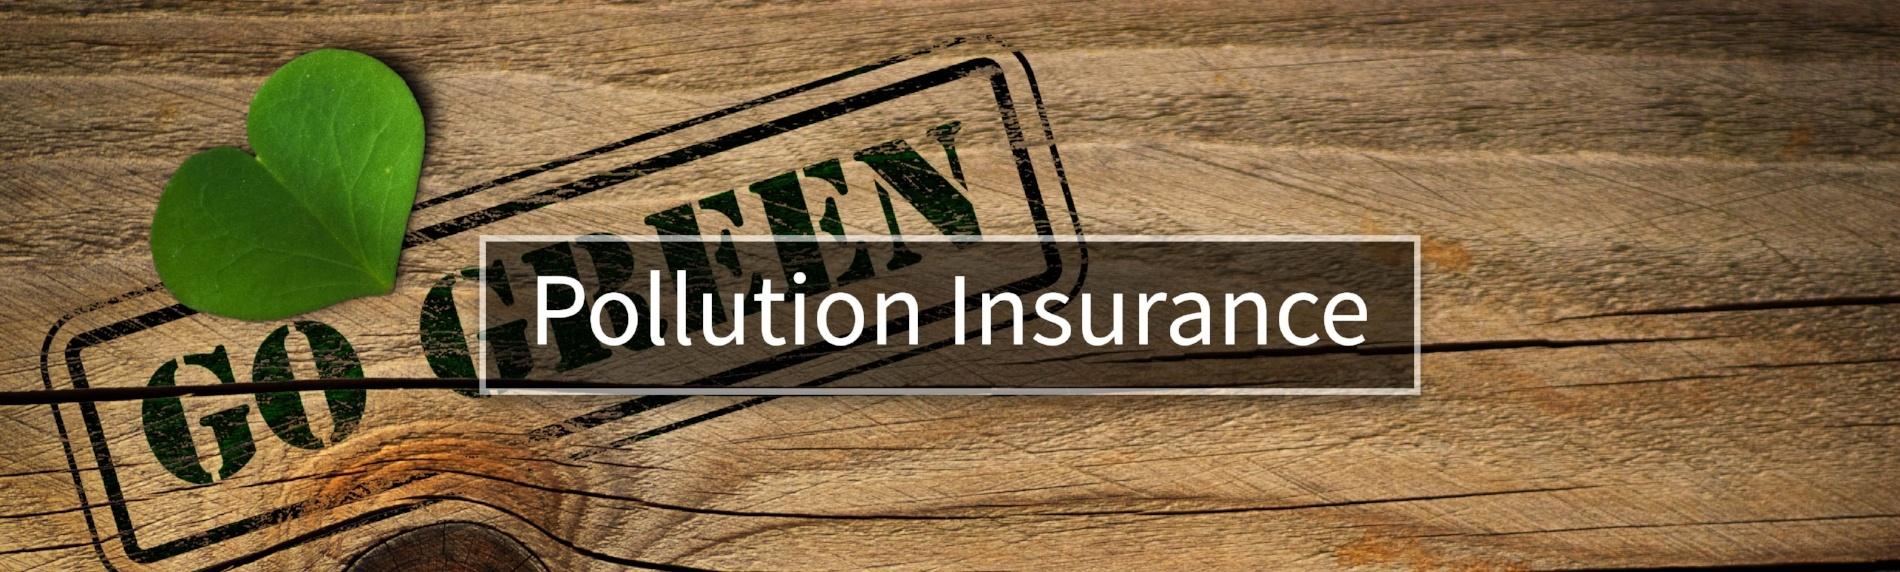 Pollution Insurance